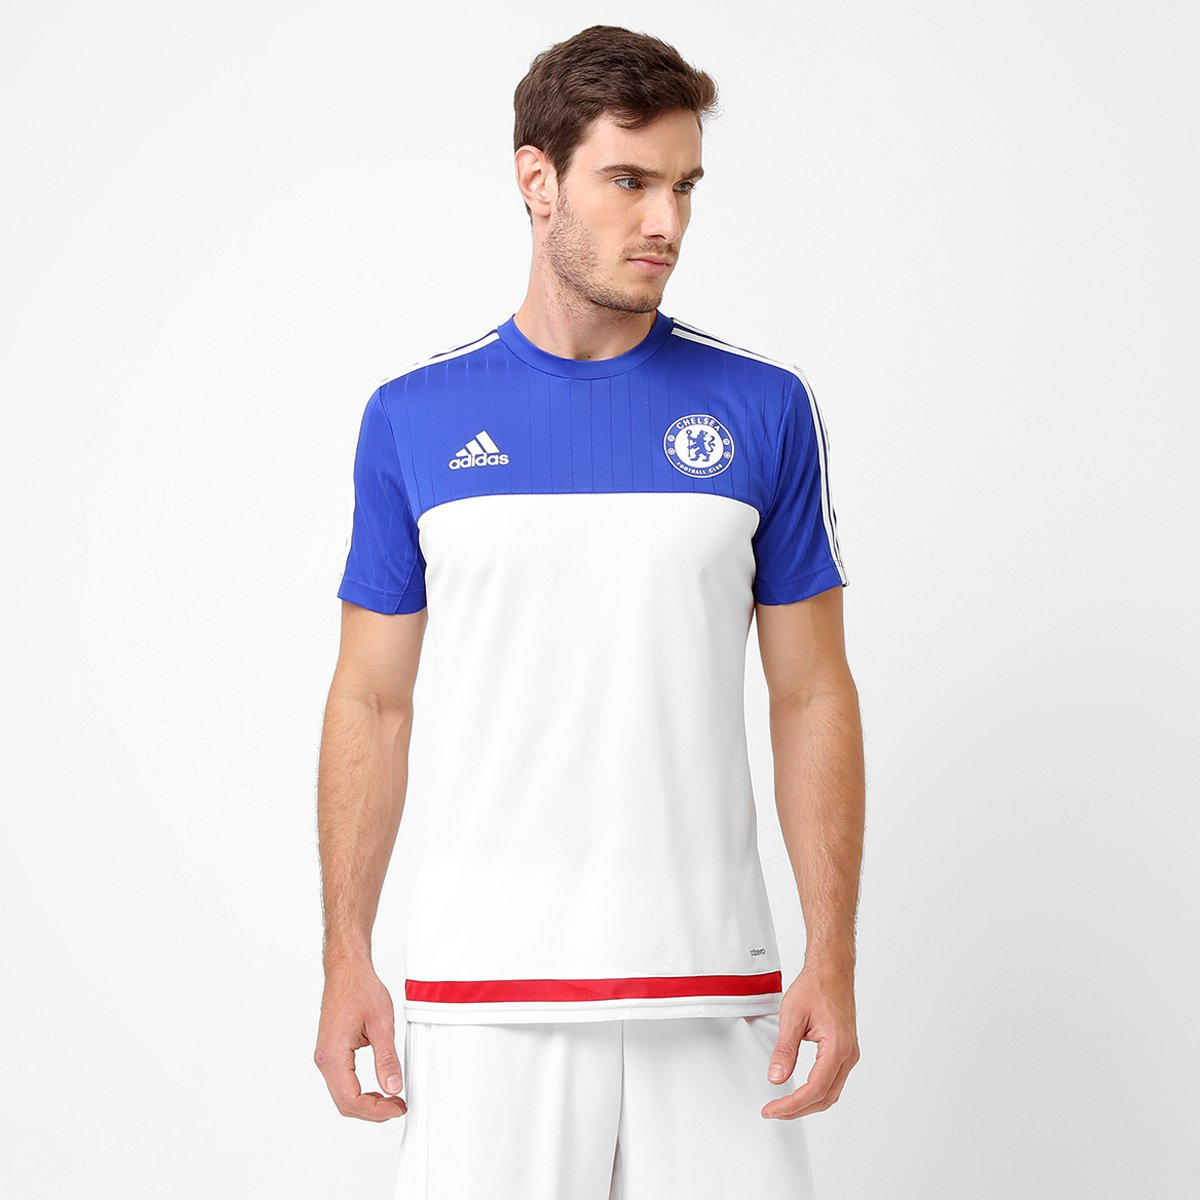 Camisa de Treino Chelsea 2015 Adidas Masculina - Compre Agora  0f0a43981d40d